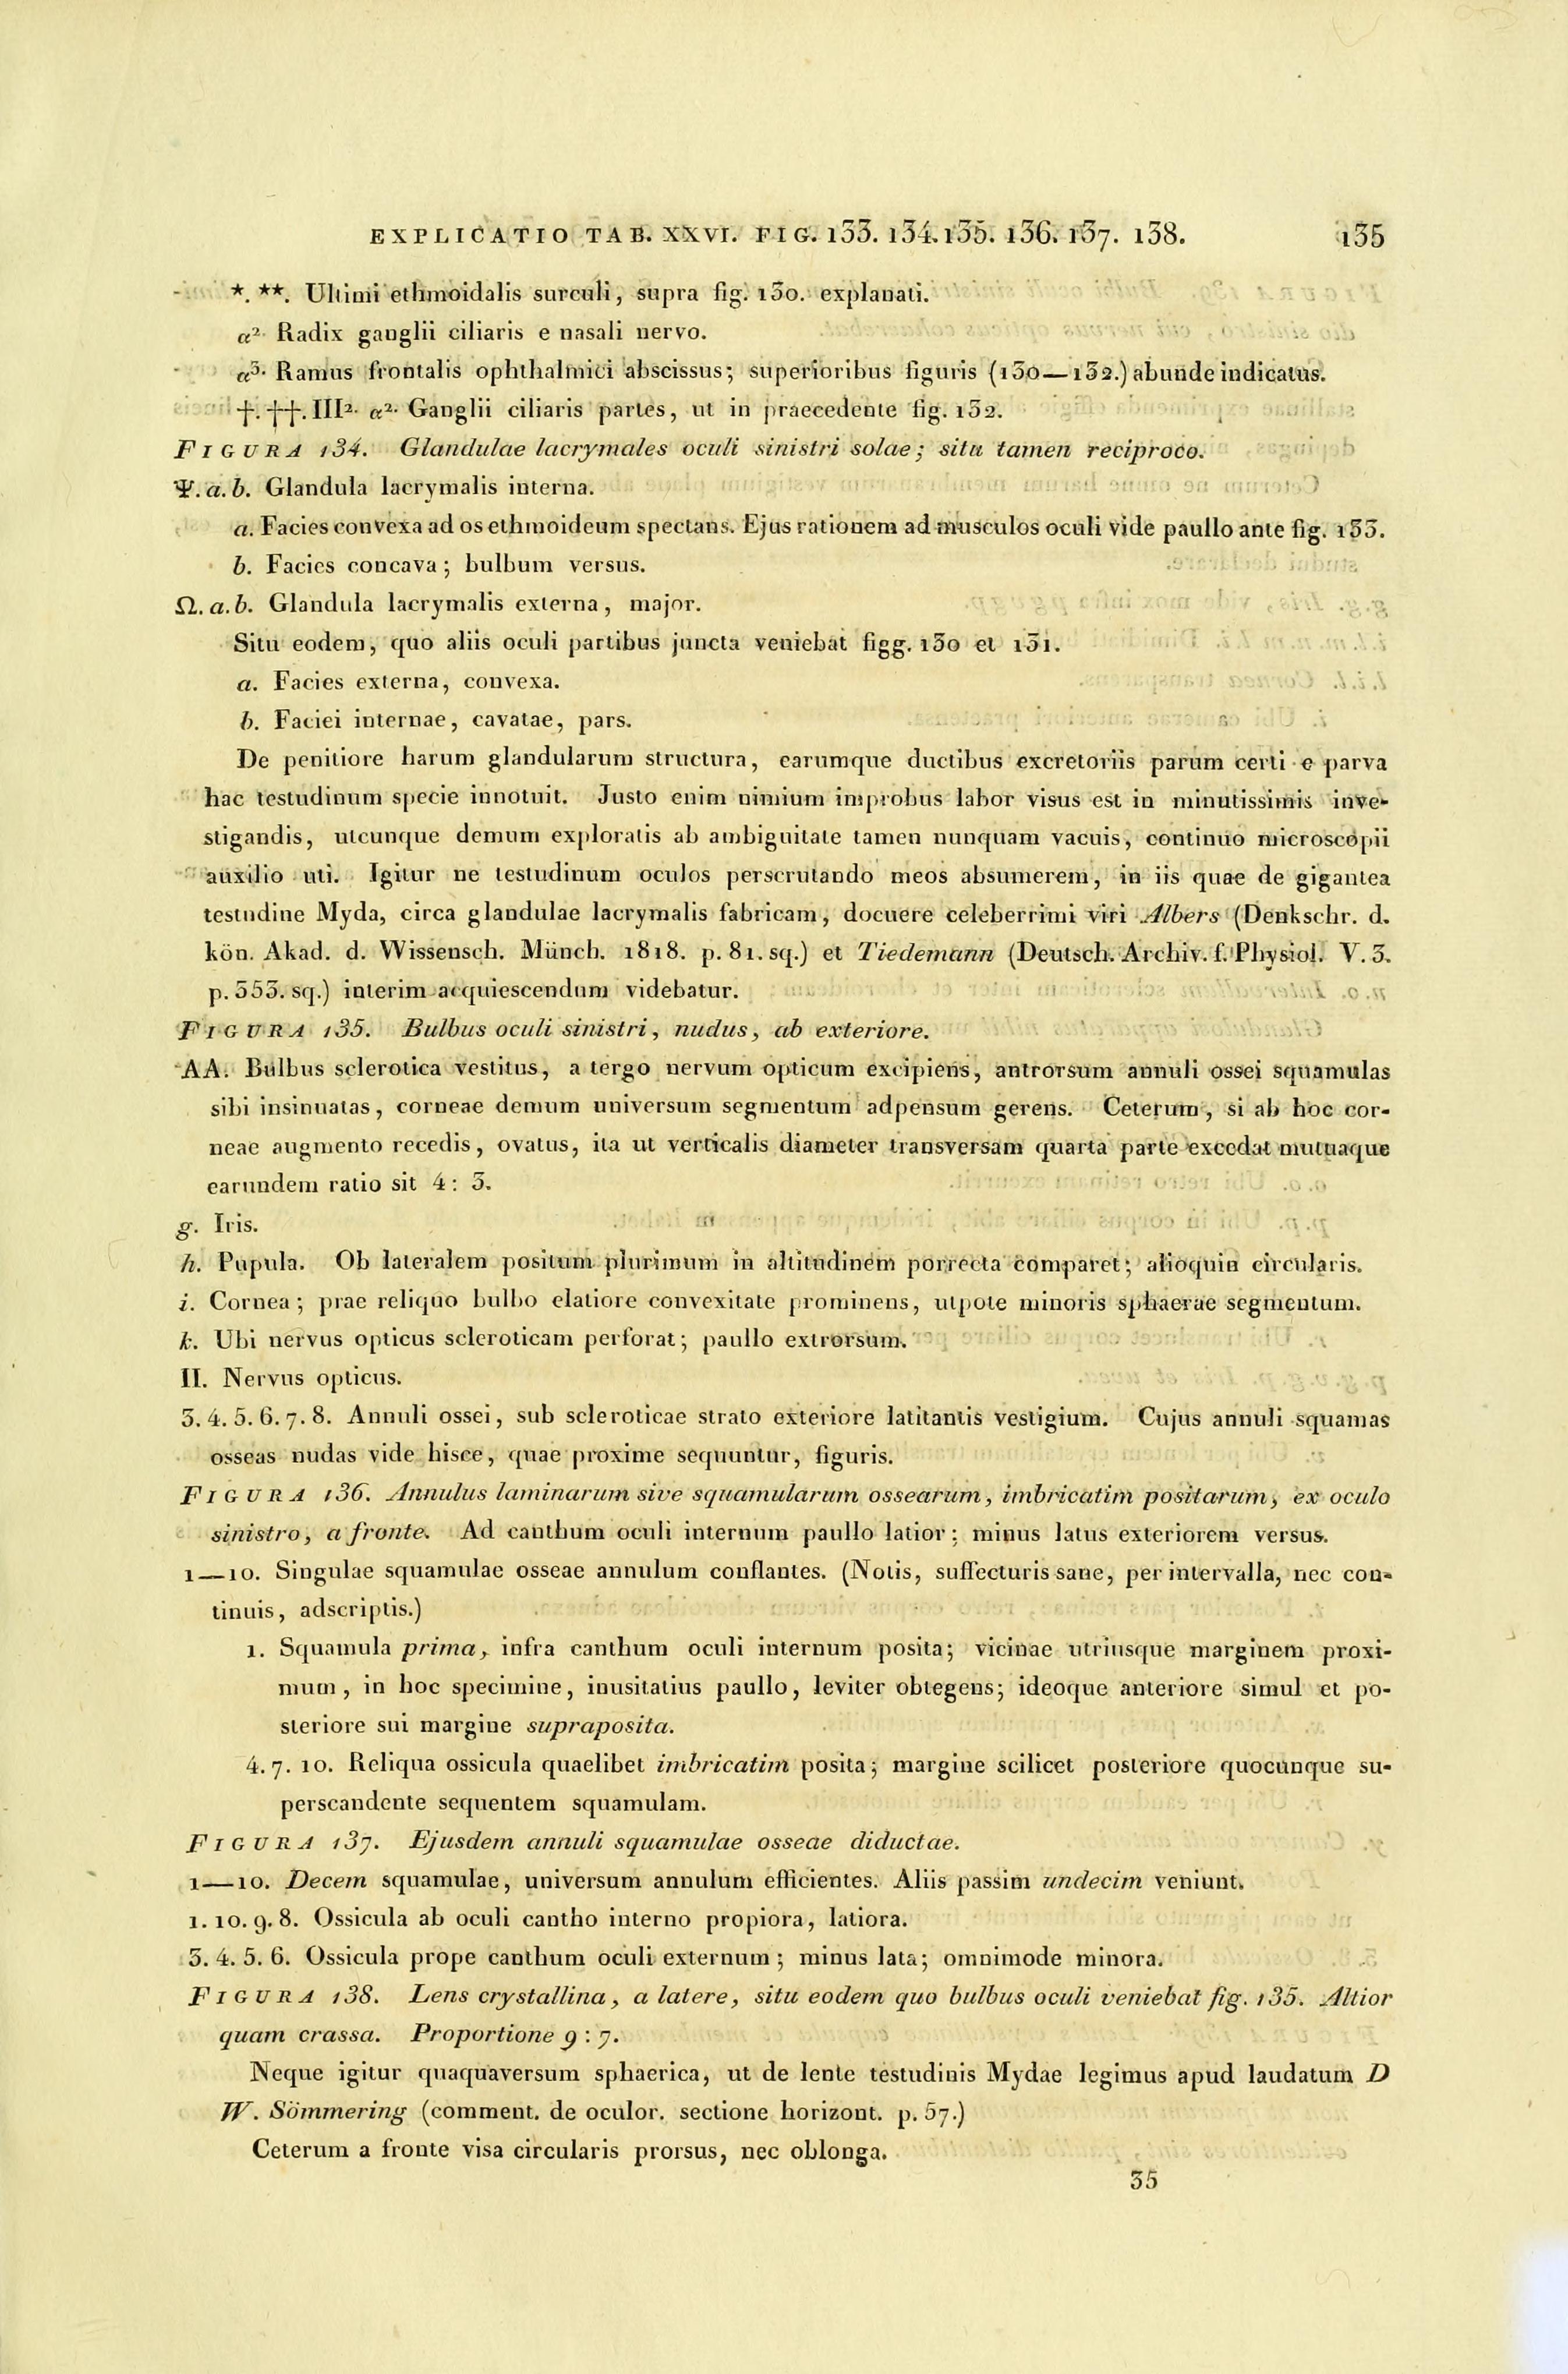 File:Anatome testudinis Europaeae (Page 135) BHL2969577.jpg ...